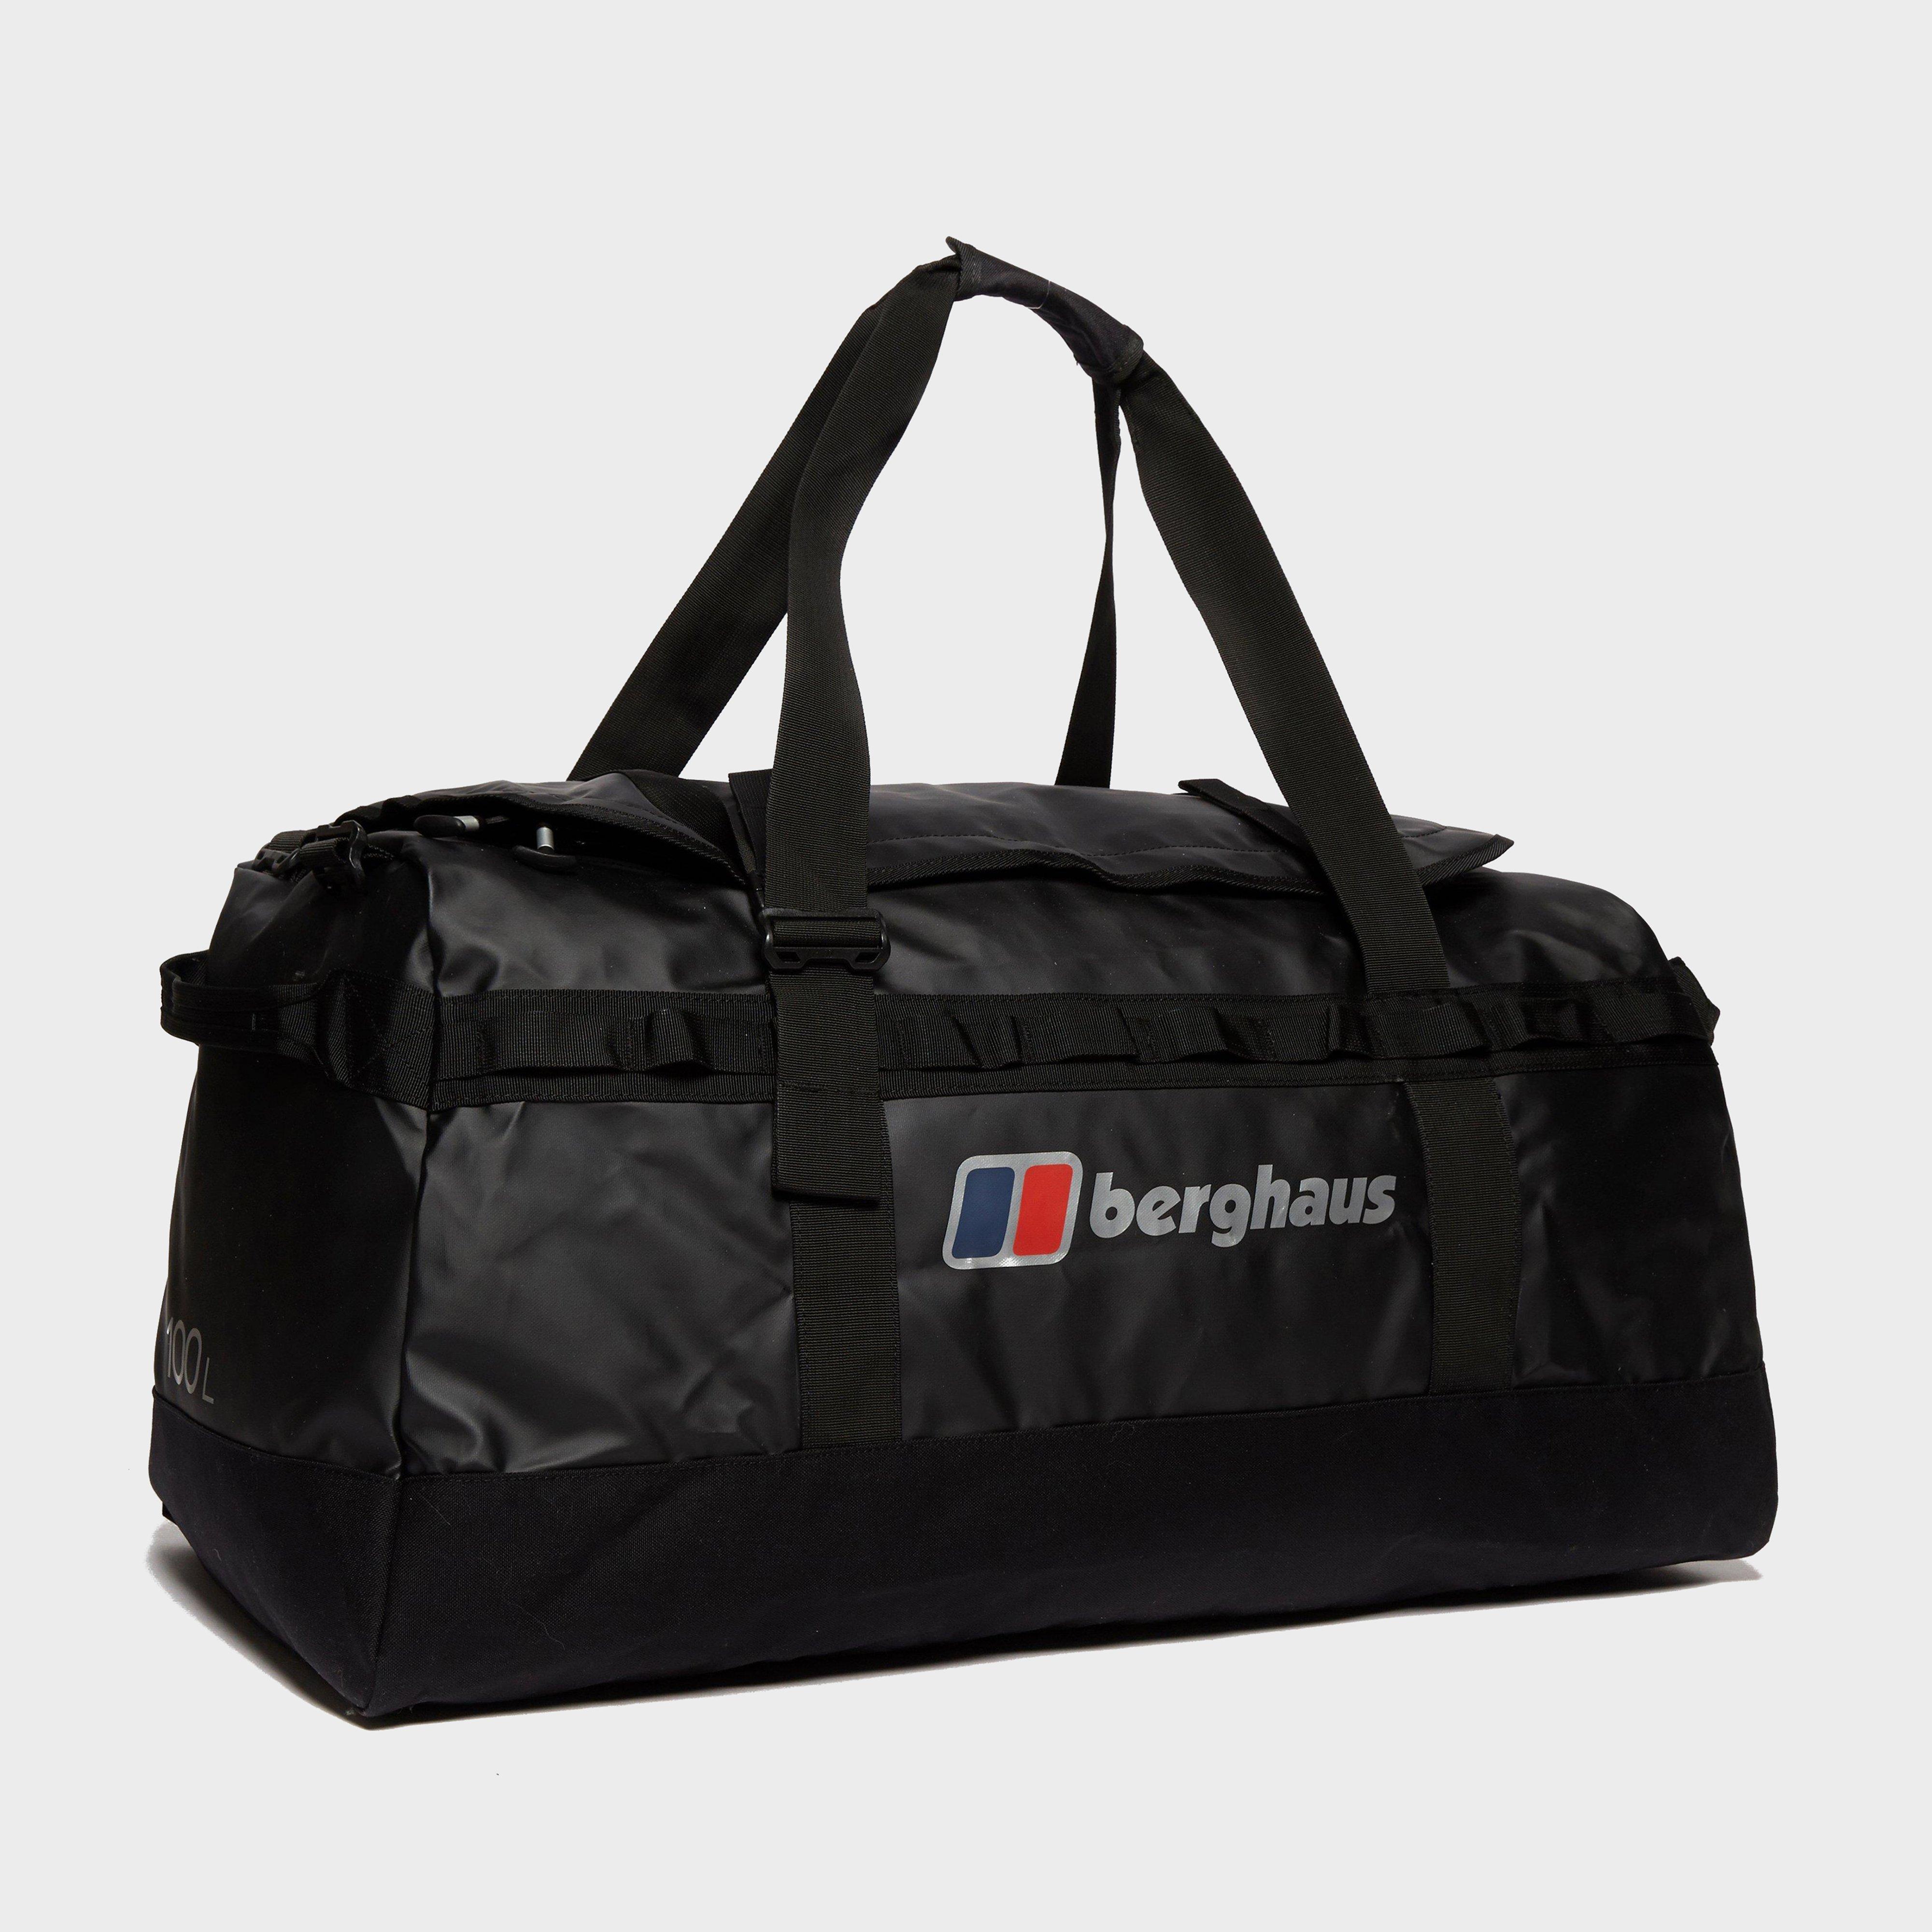 Berghaus 100L Holdall, Black